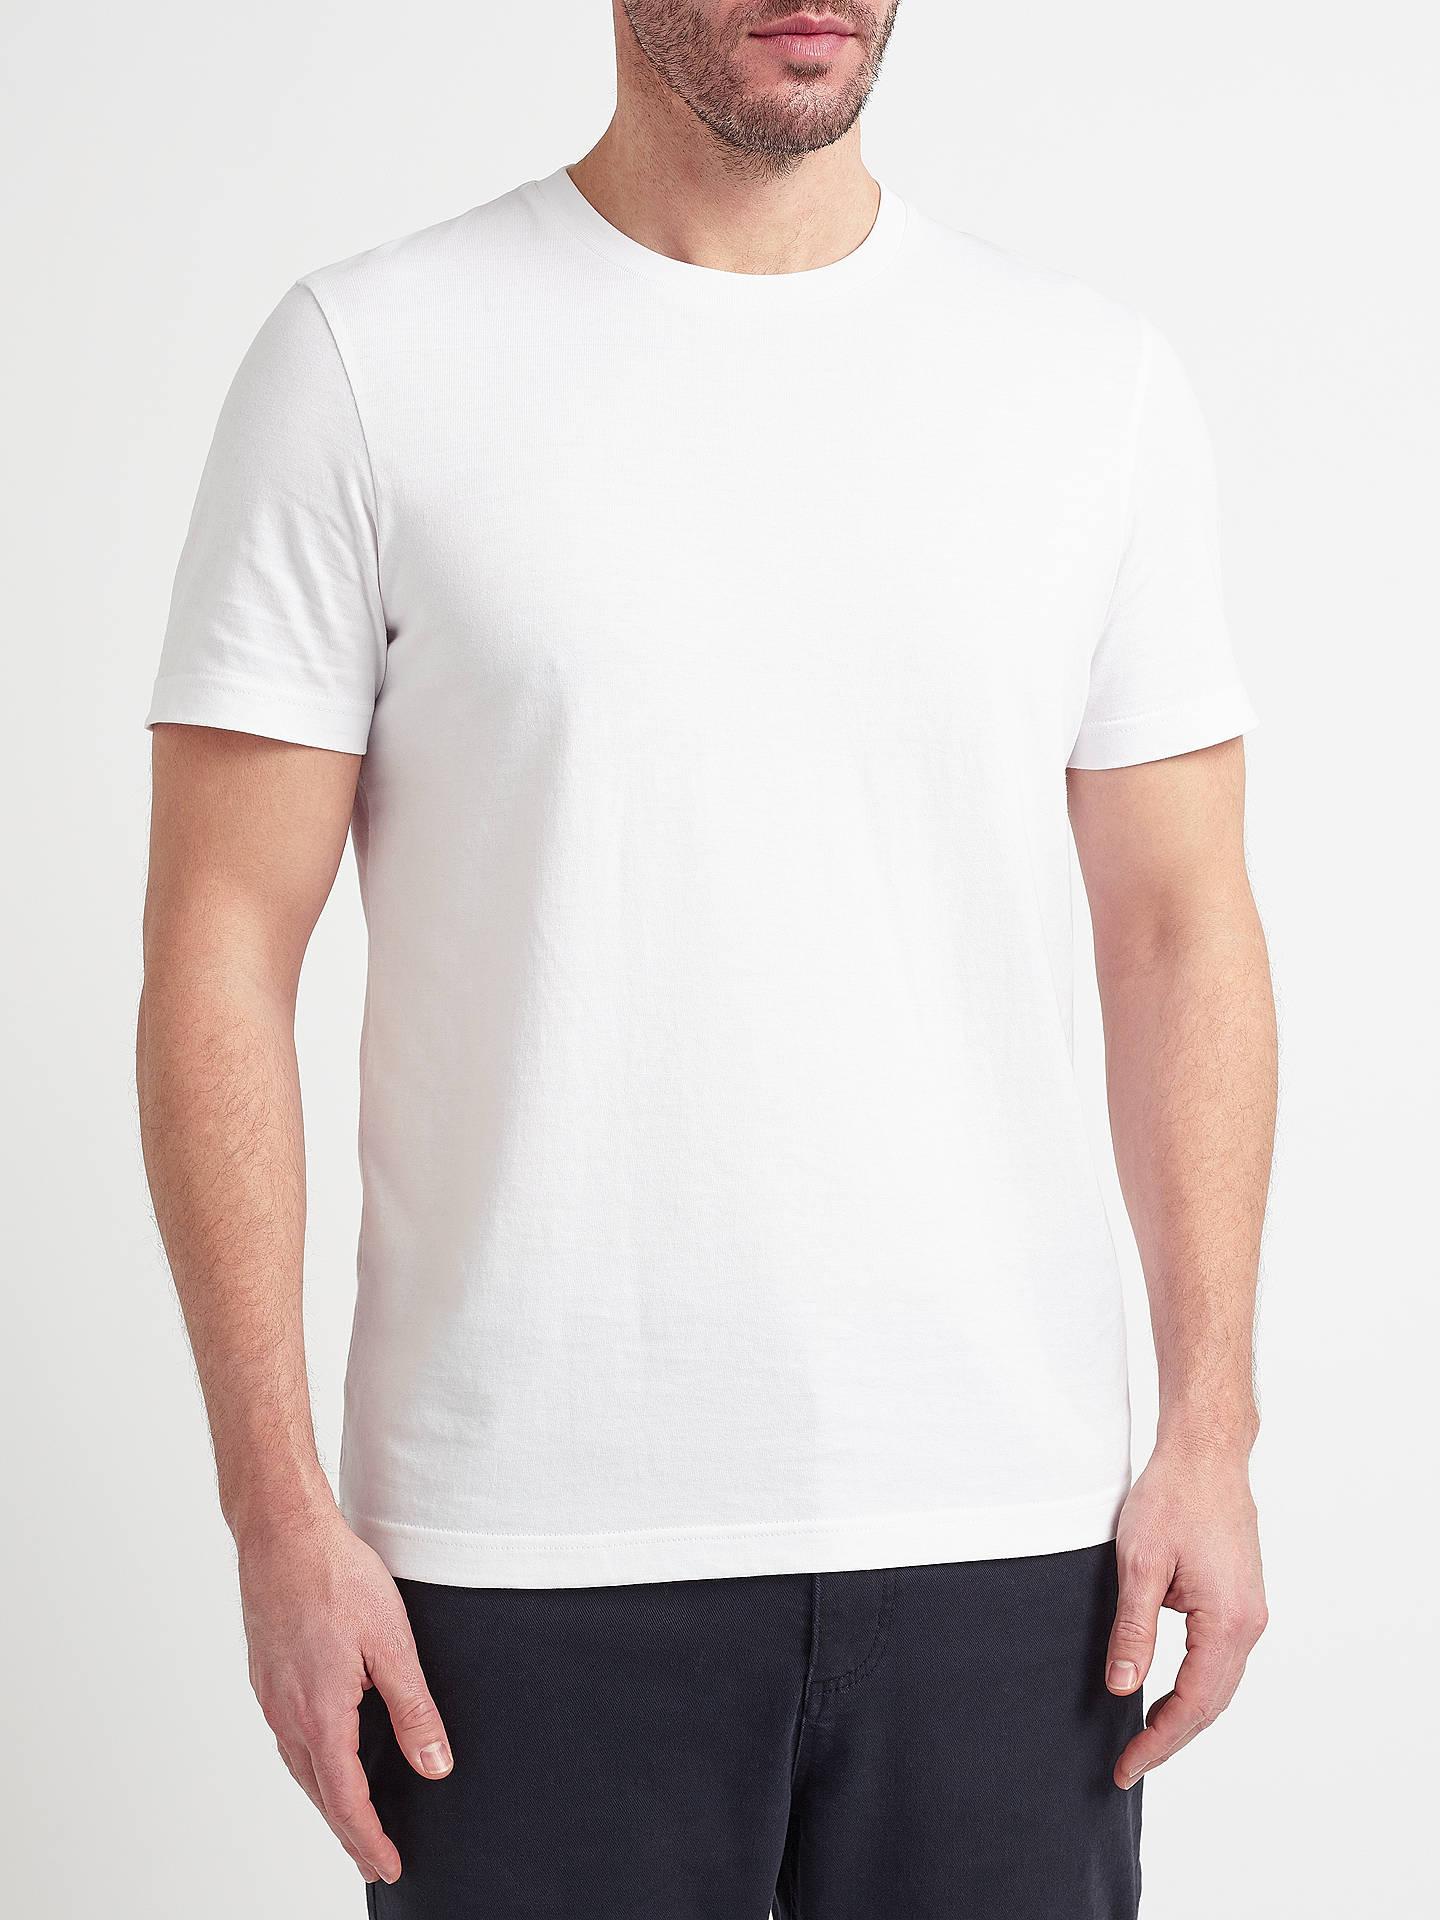 dea50631d515 Buy John Lewis & Partners Organic Cotton T-Shirt, White, S Online at ...